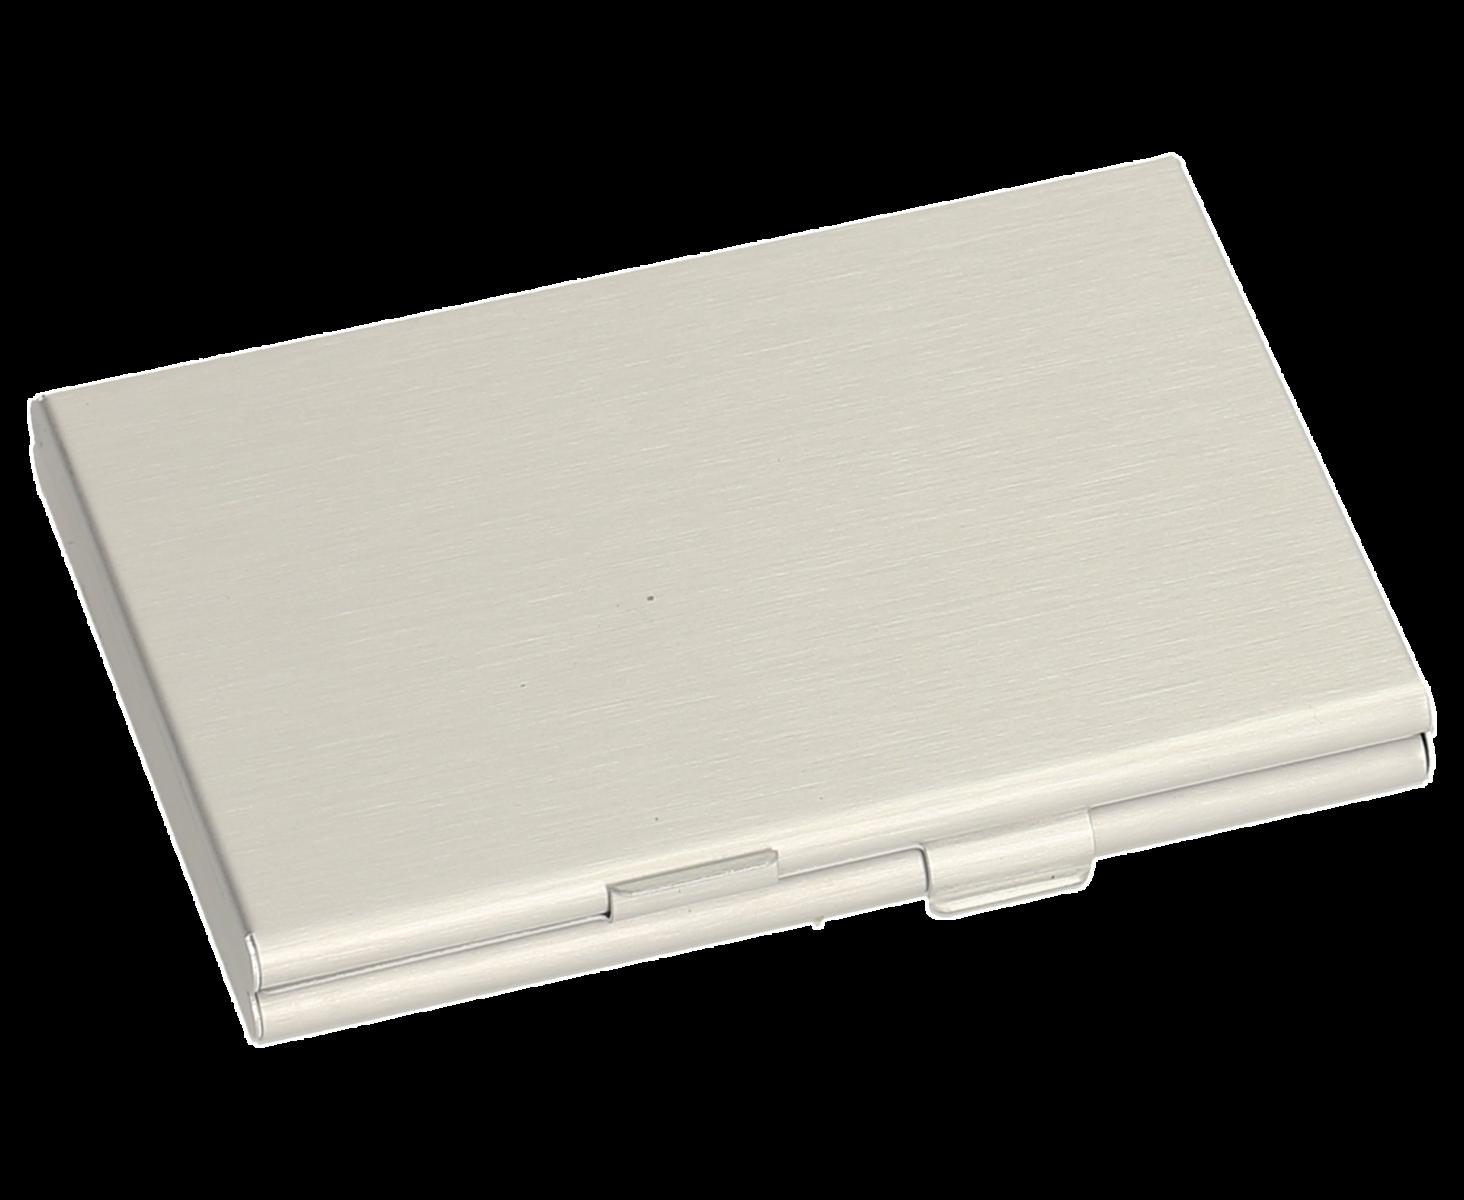 Sigel Visitenkarten Etui Twin Aluminium Silber 92 Mm